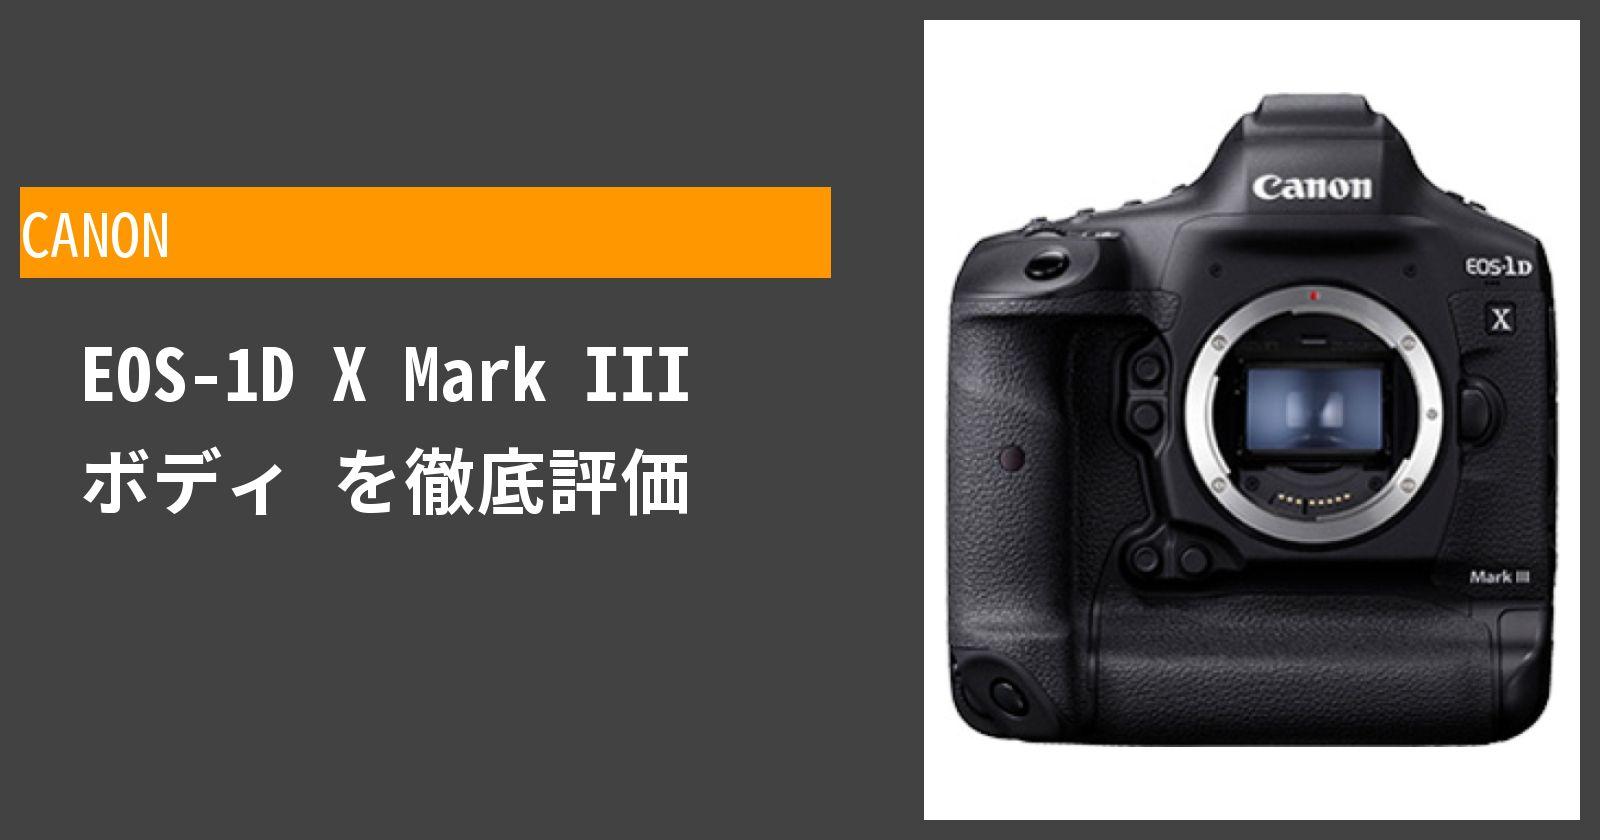 EOS-1D X Mark III ボディを徹底評価